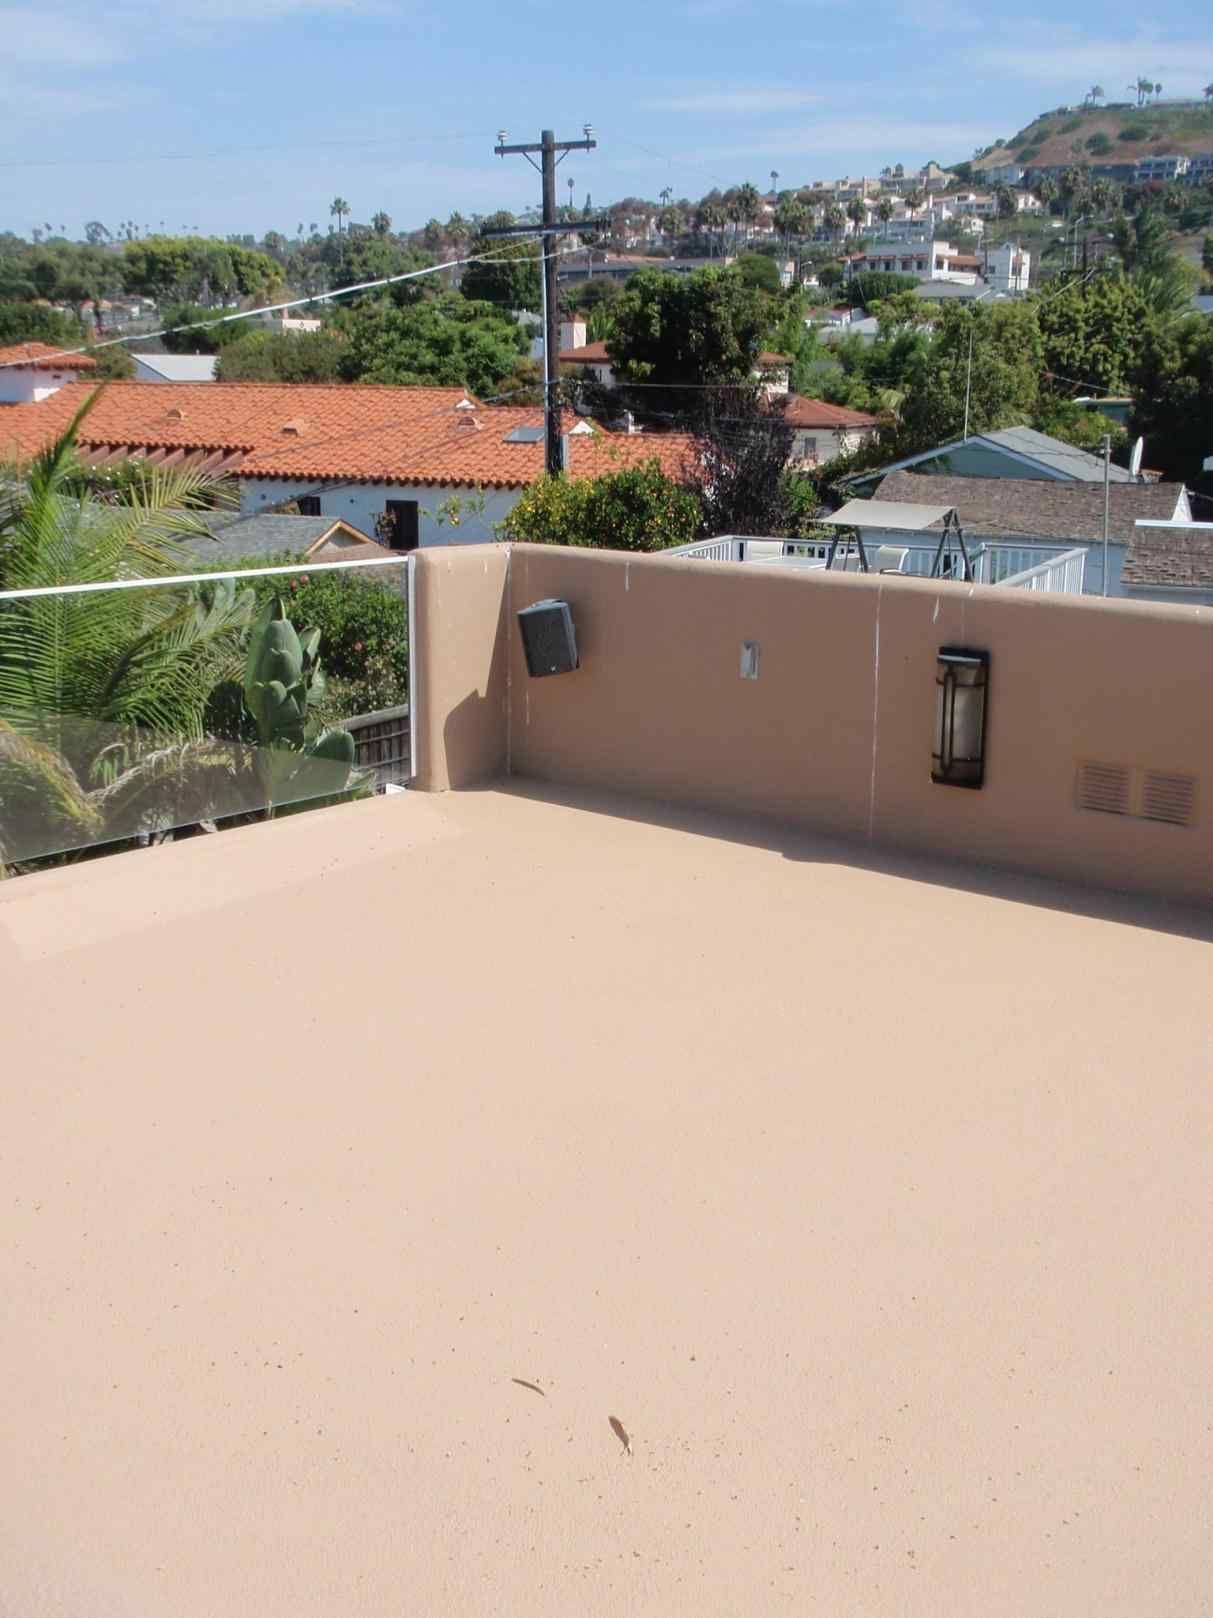 Concrete Roof Deck Waterproofing Home Roof Ideas Concrete Roof Roof Deck Roofing